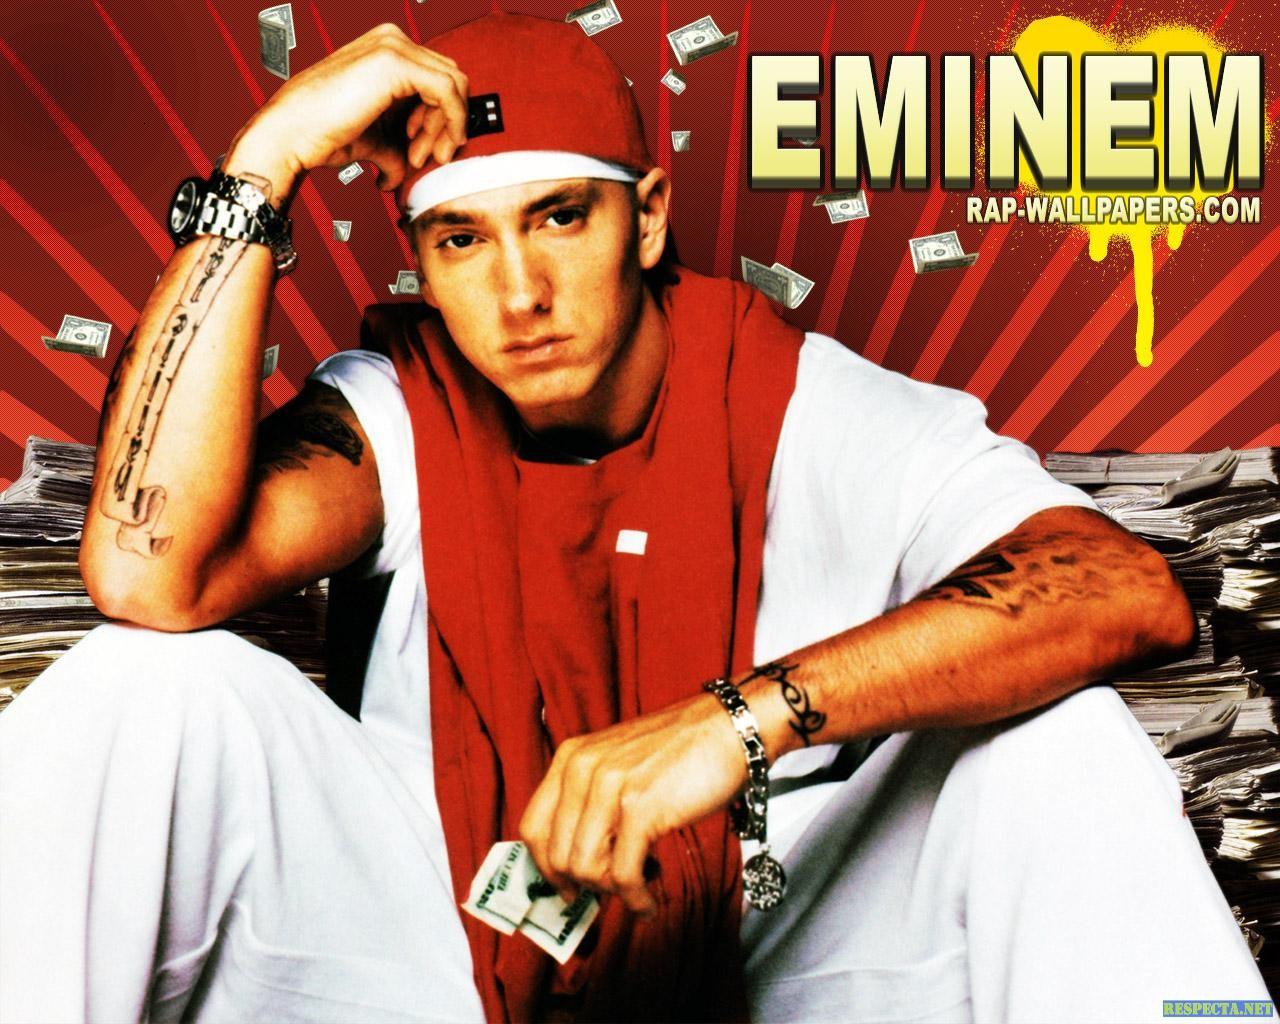 http://1.bp.blogspot.com/-B8n8FESPFrA/TWfWFDlrFJI/AAAAAAAAAFA/OOD3EX0_r-g/s1600/Eminem-Recovery-Leak.jpg